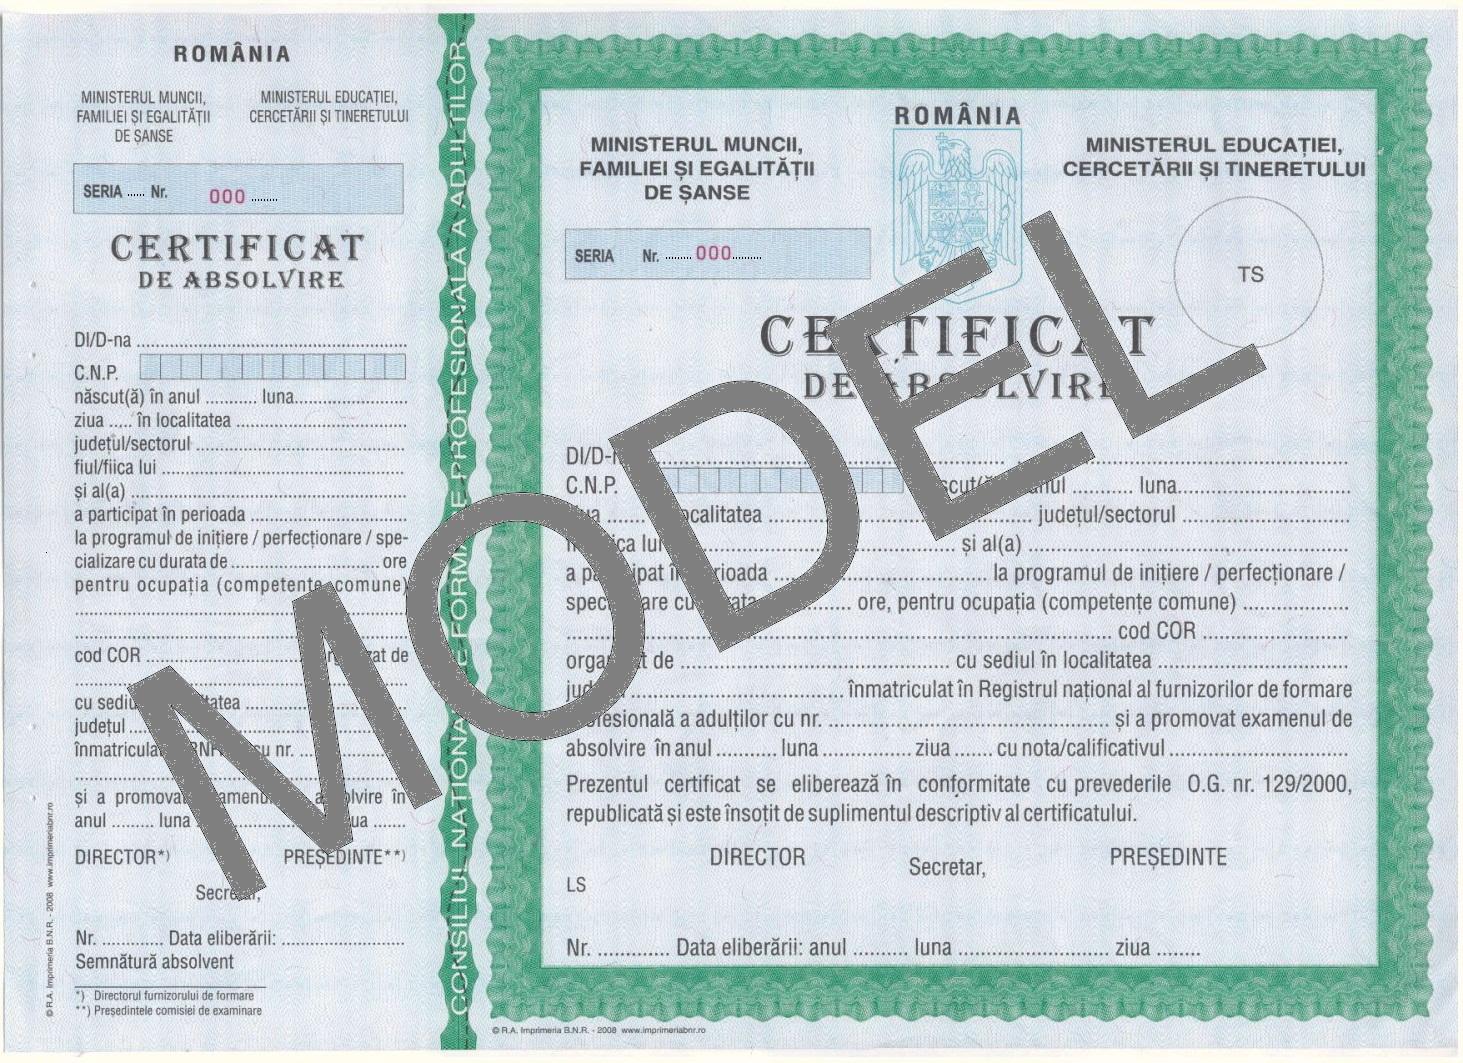 https://i2.wp.com/vindecativiata.ro/wp-content/uploads/2015/02/certificat_absolvire.jpg